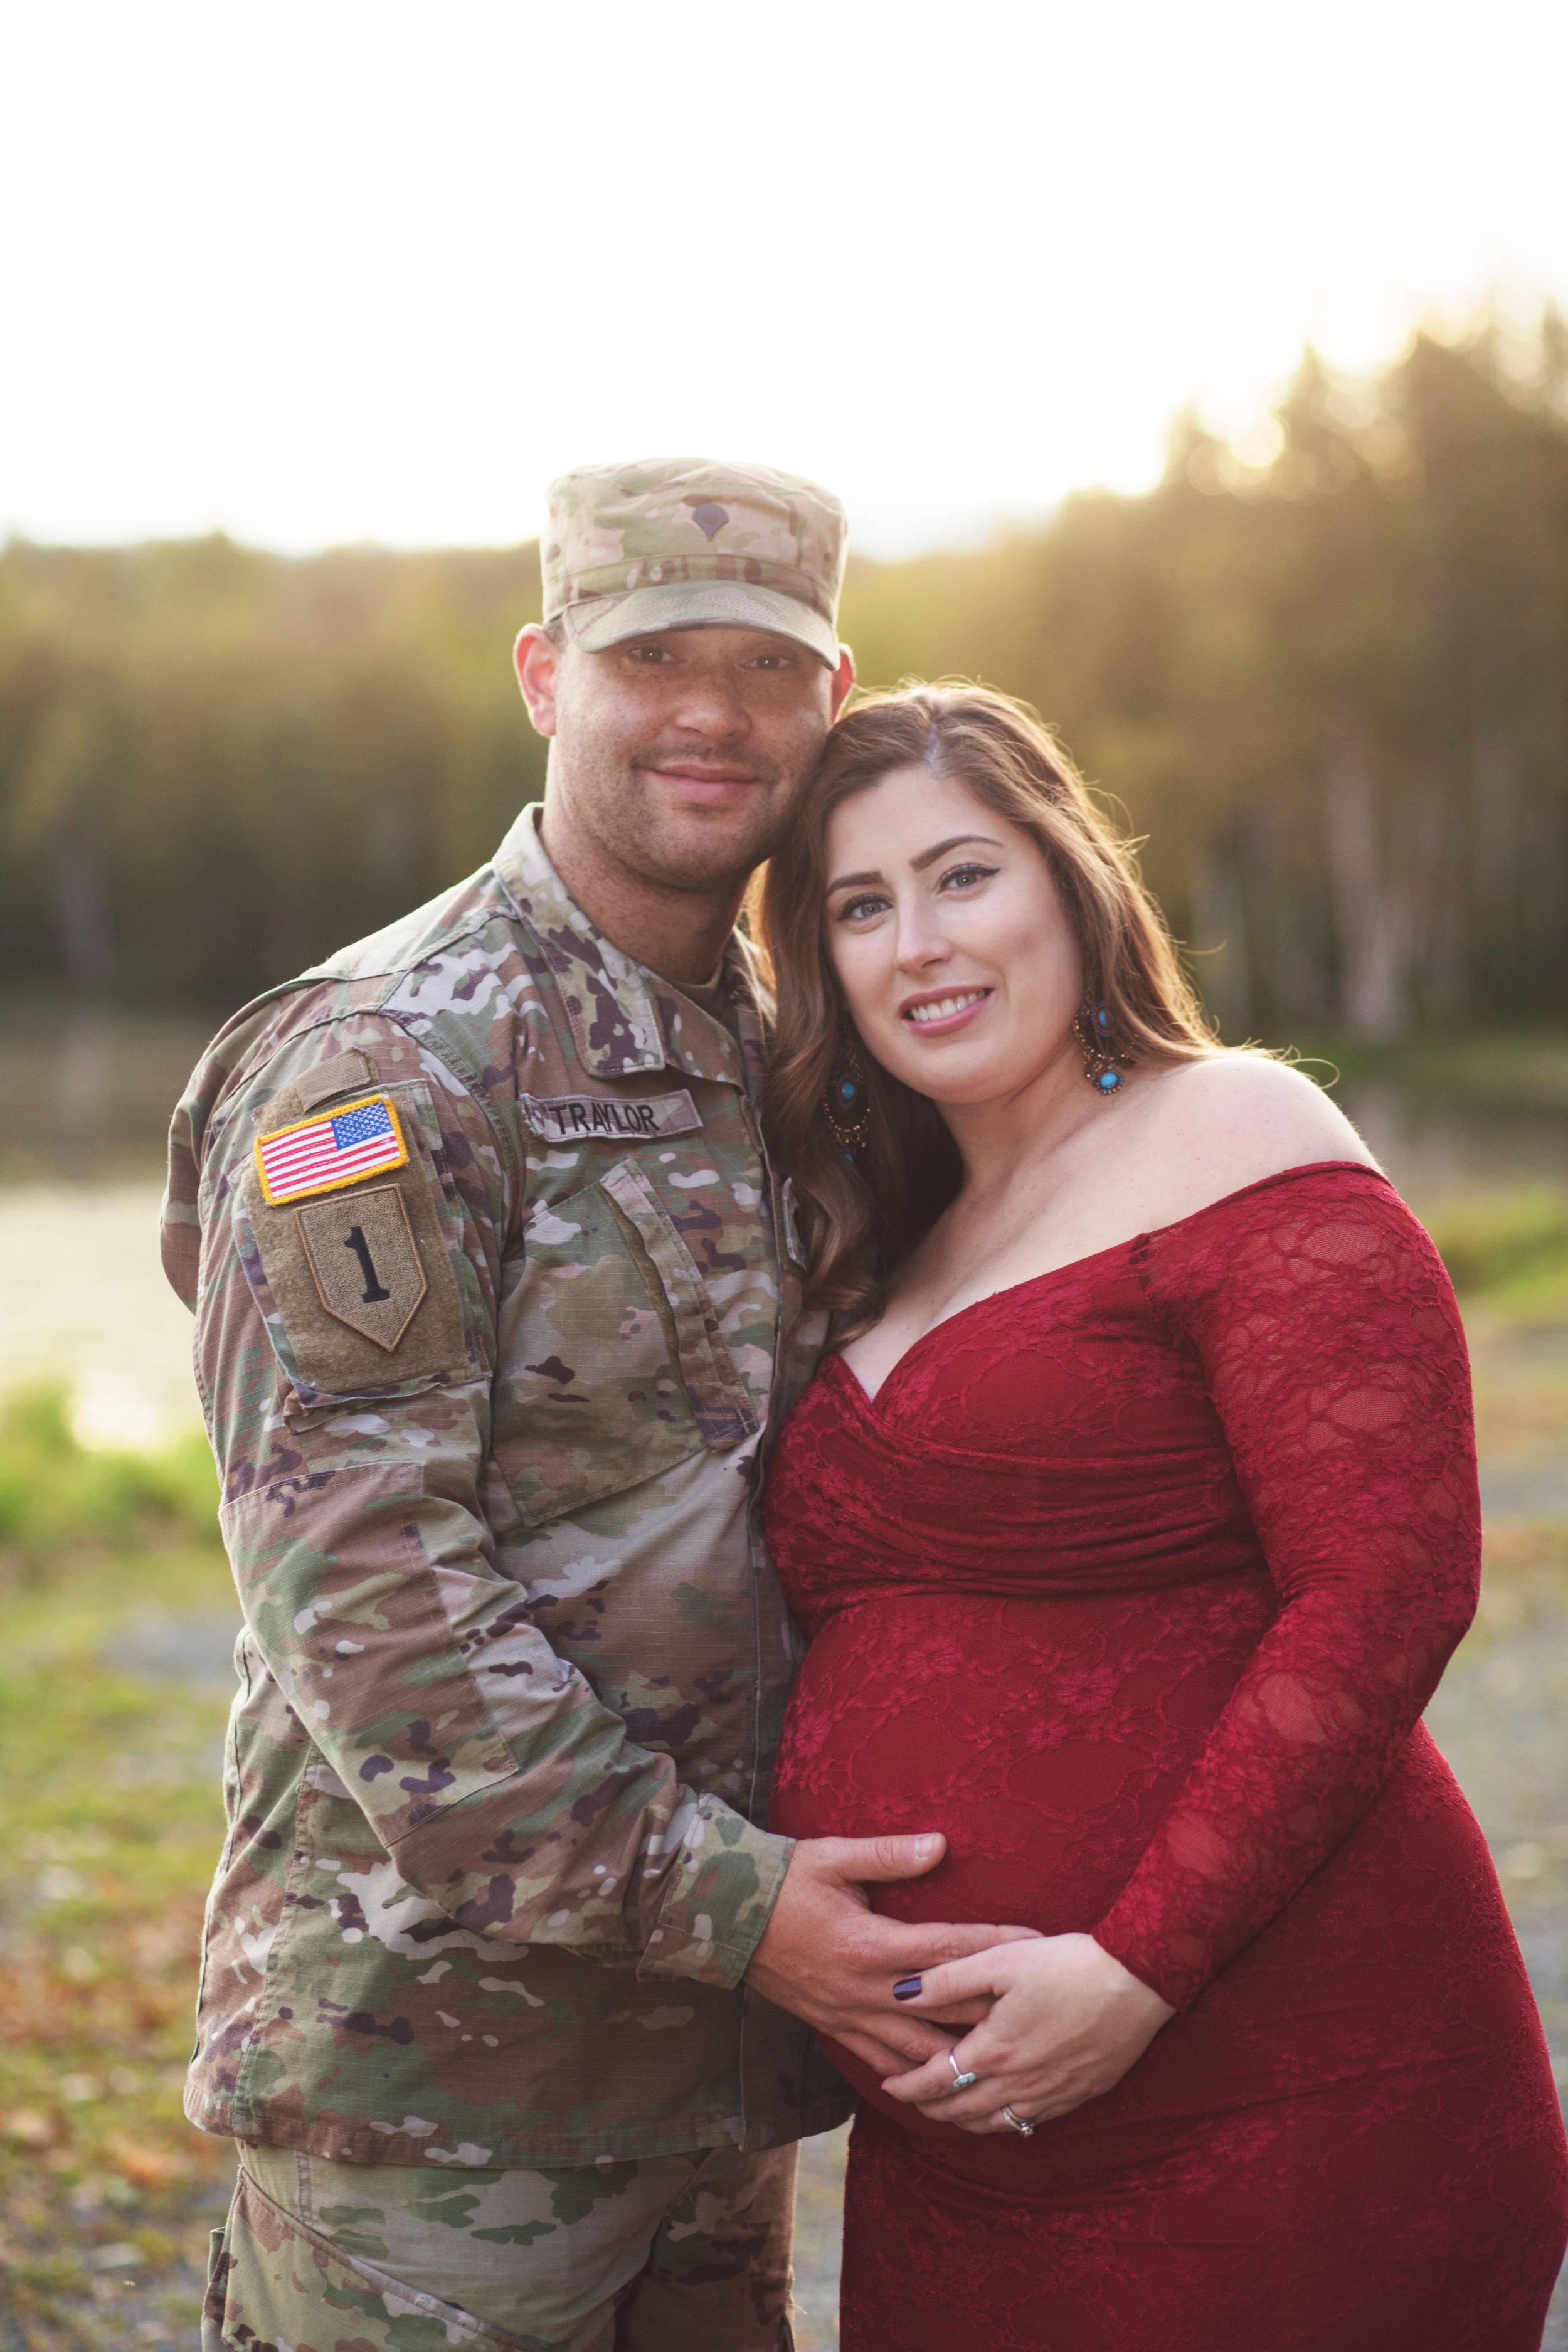 anchorage-maternity-photographer-10.jpg